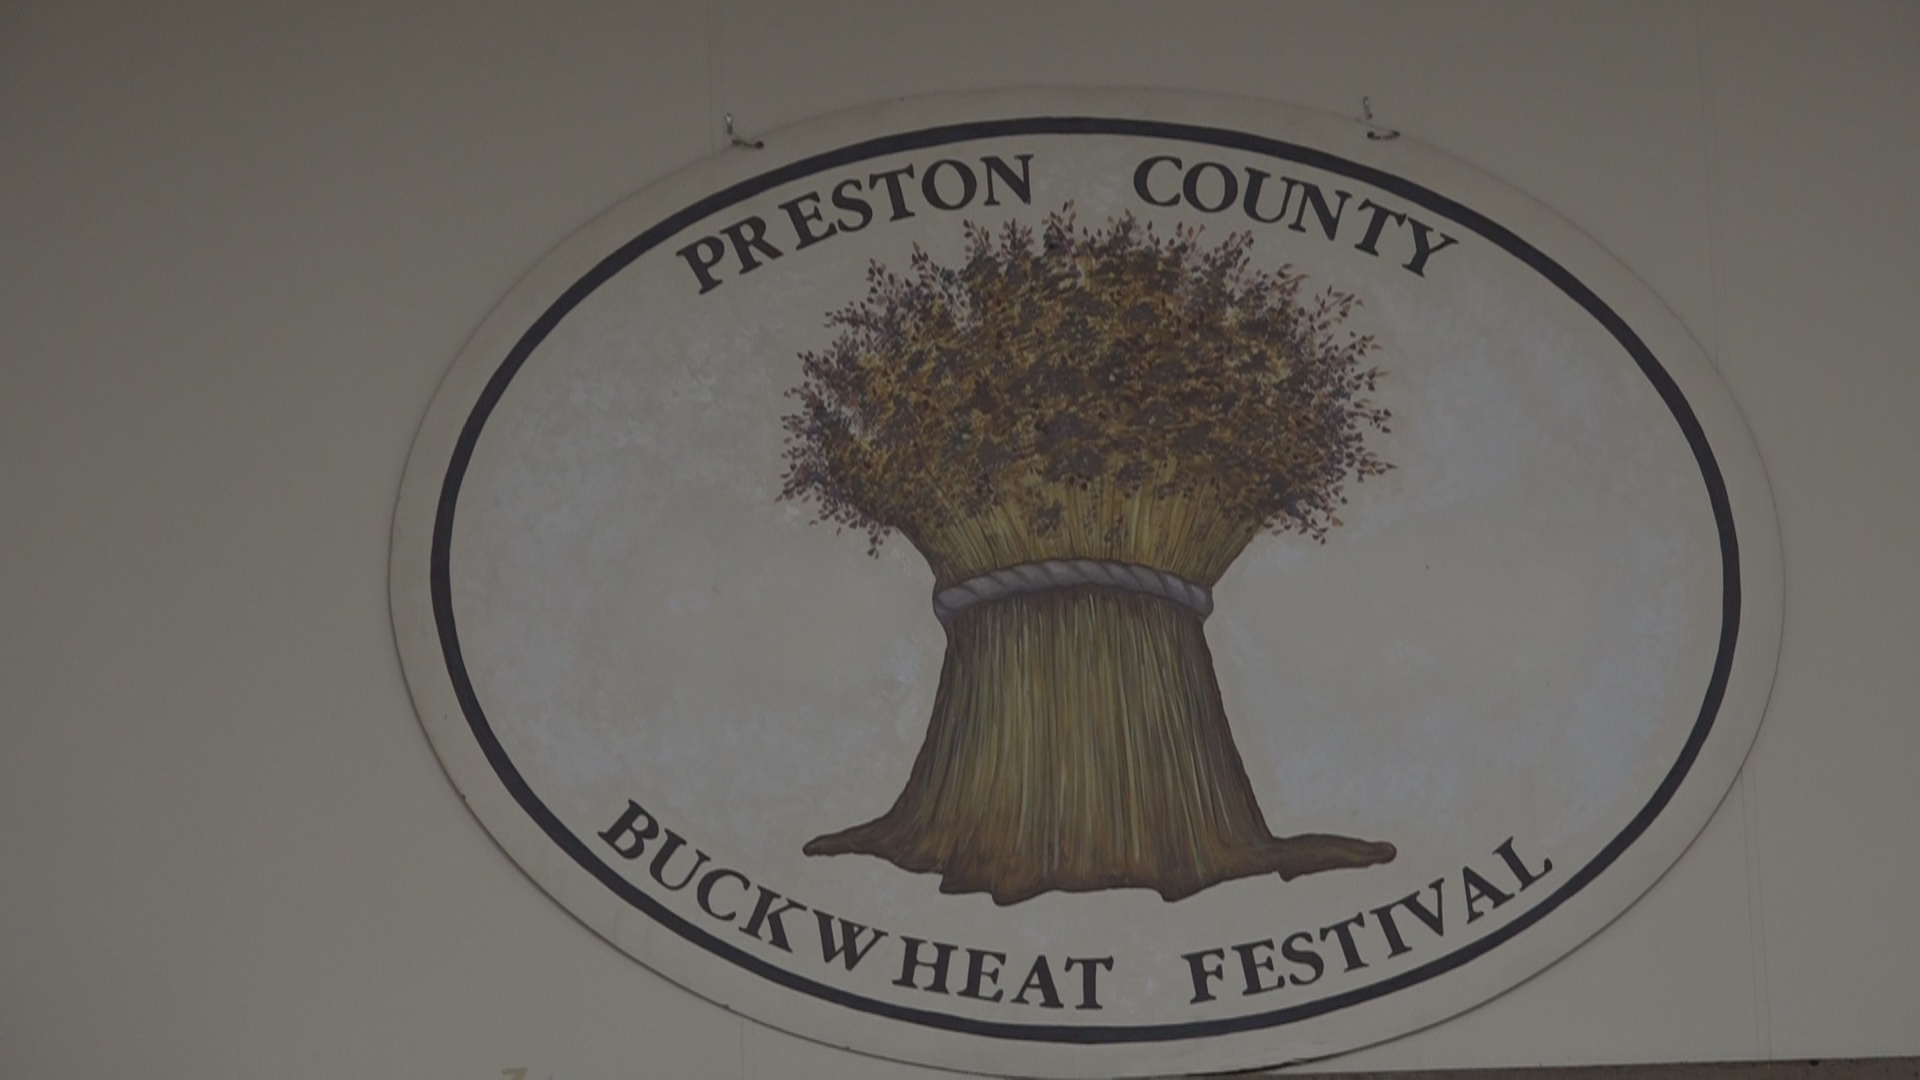 Buckwheat Festival_1538011321126.jpg.jpg